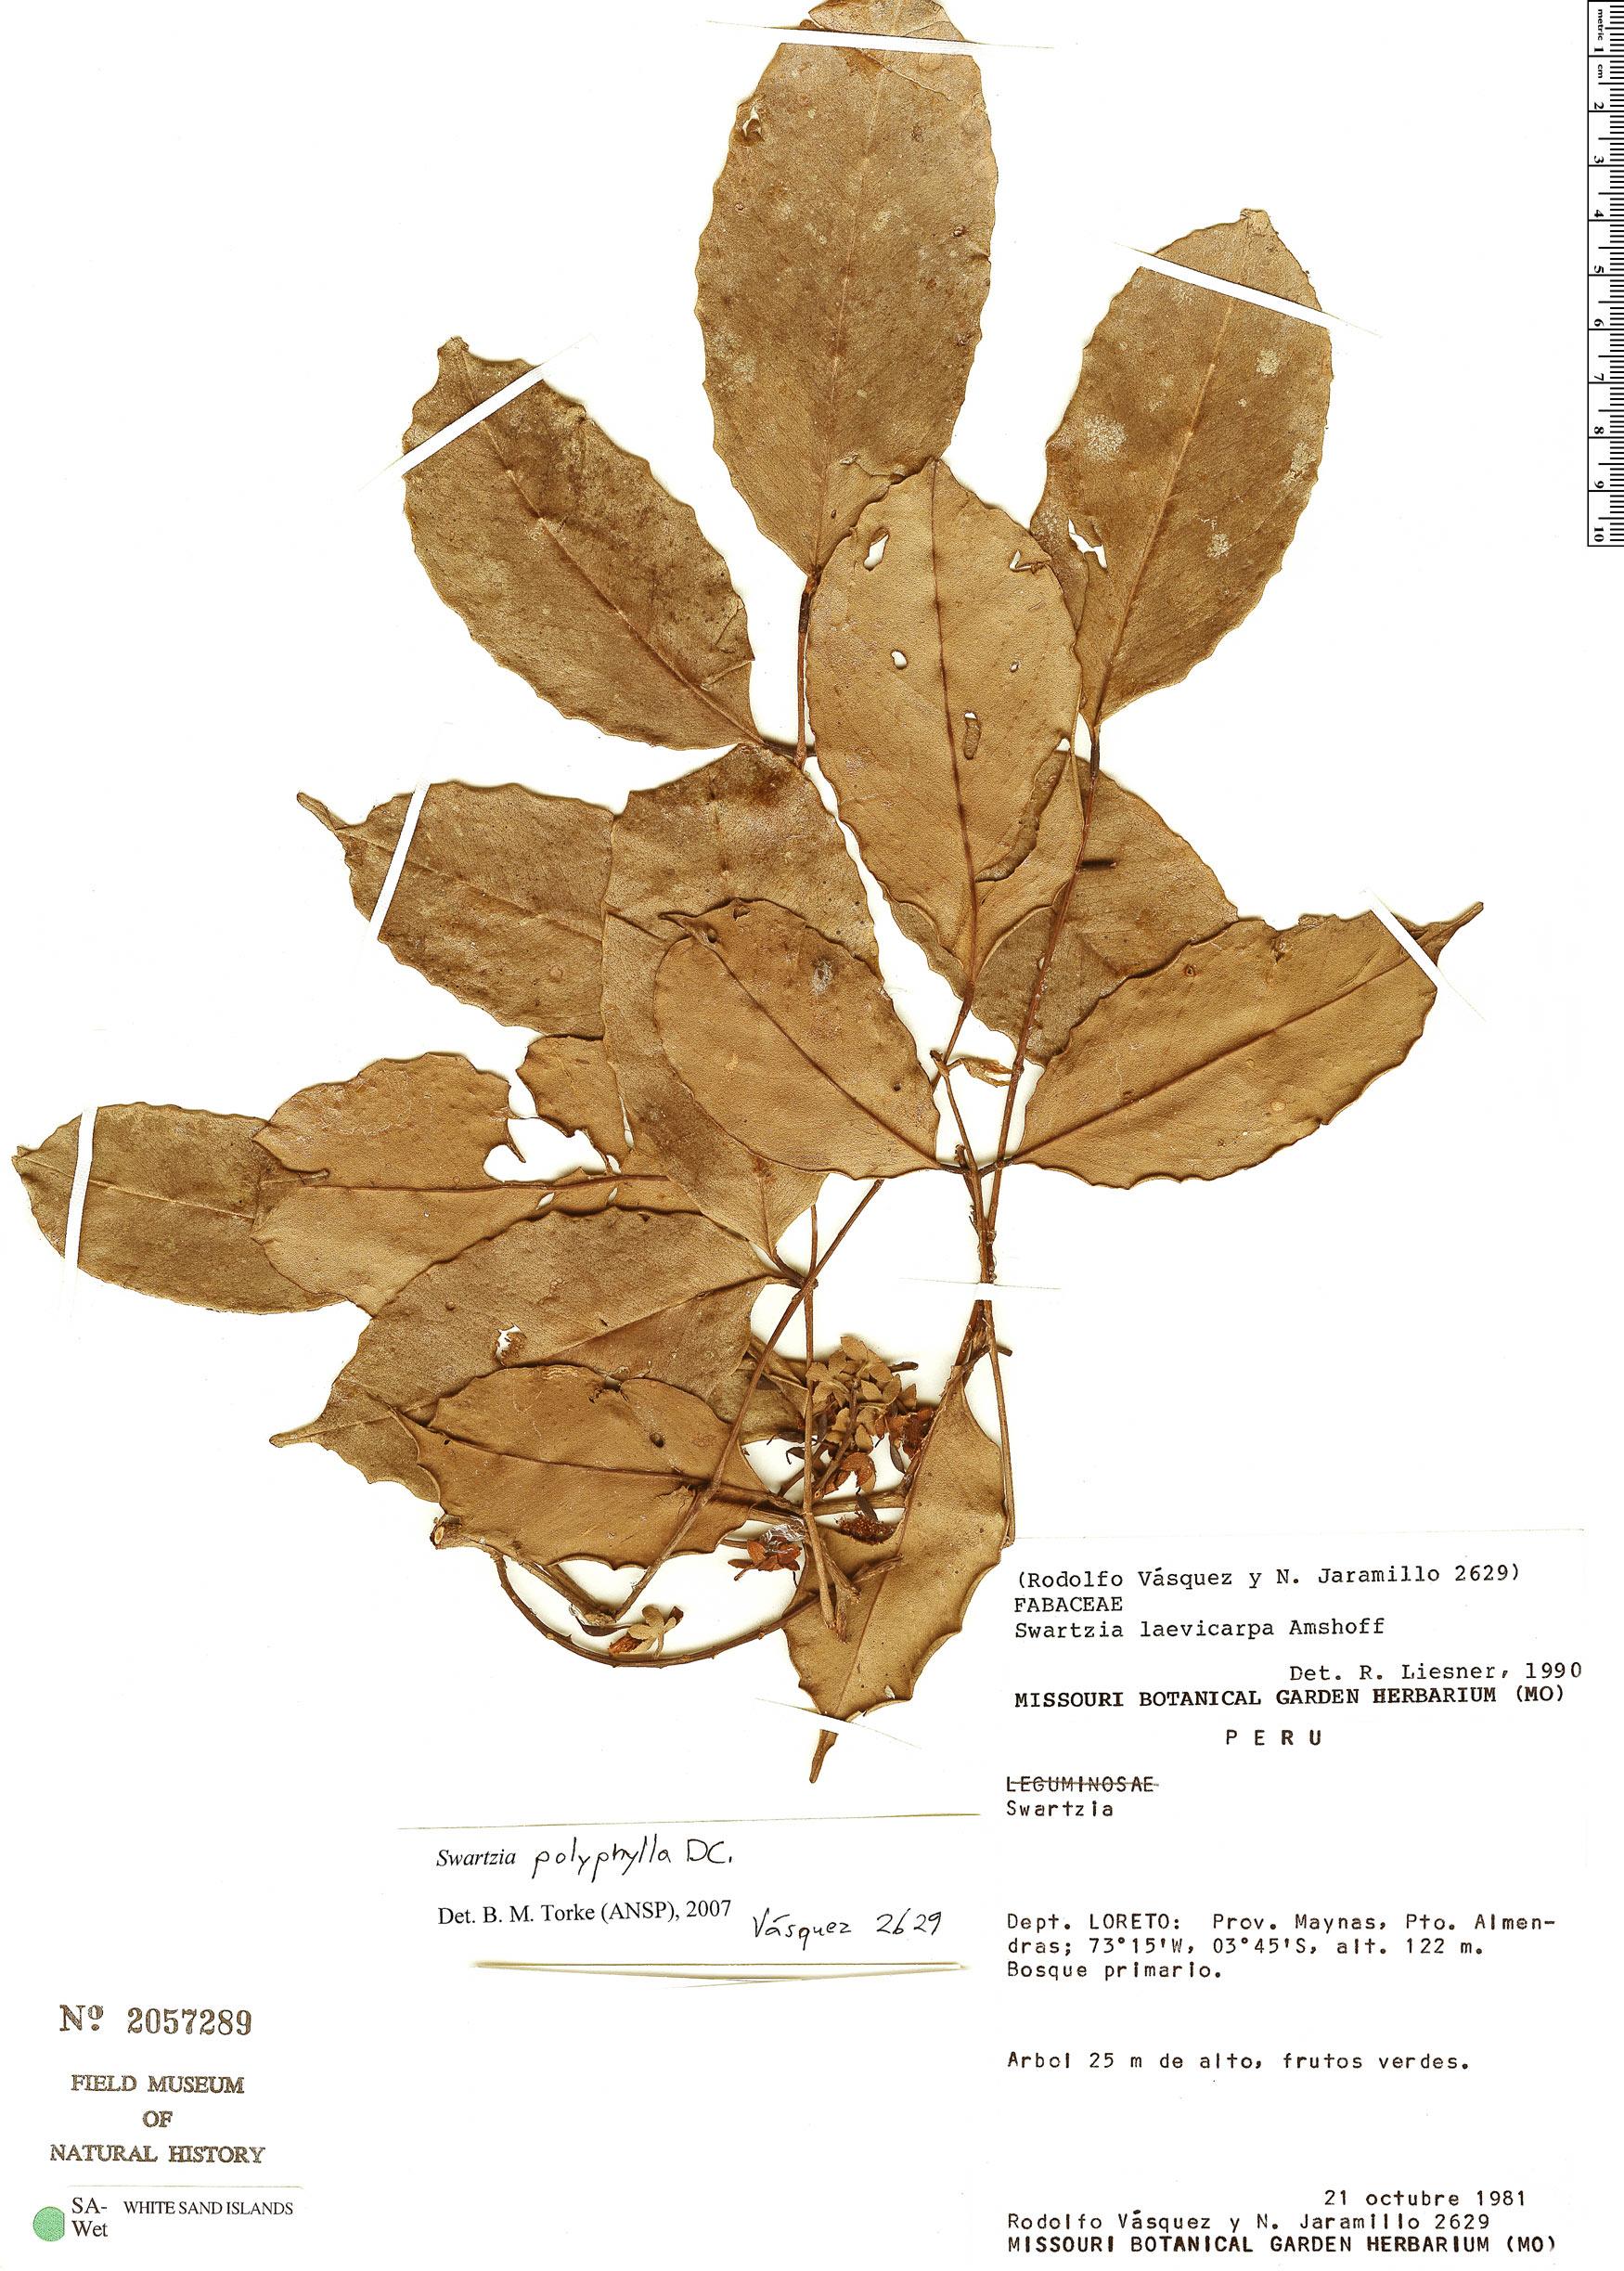 Specimen: Swartzia polyphylla